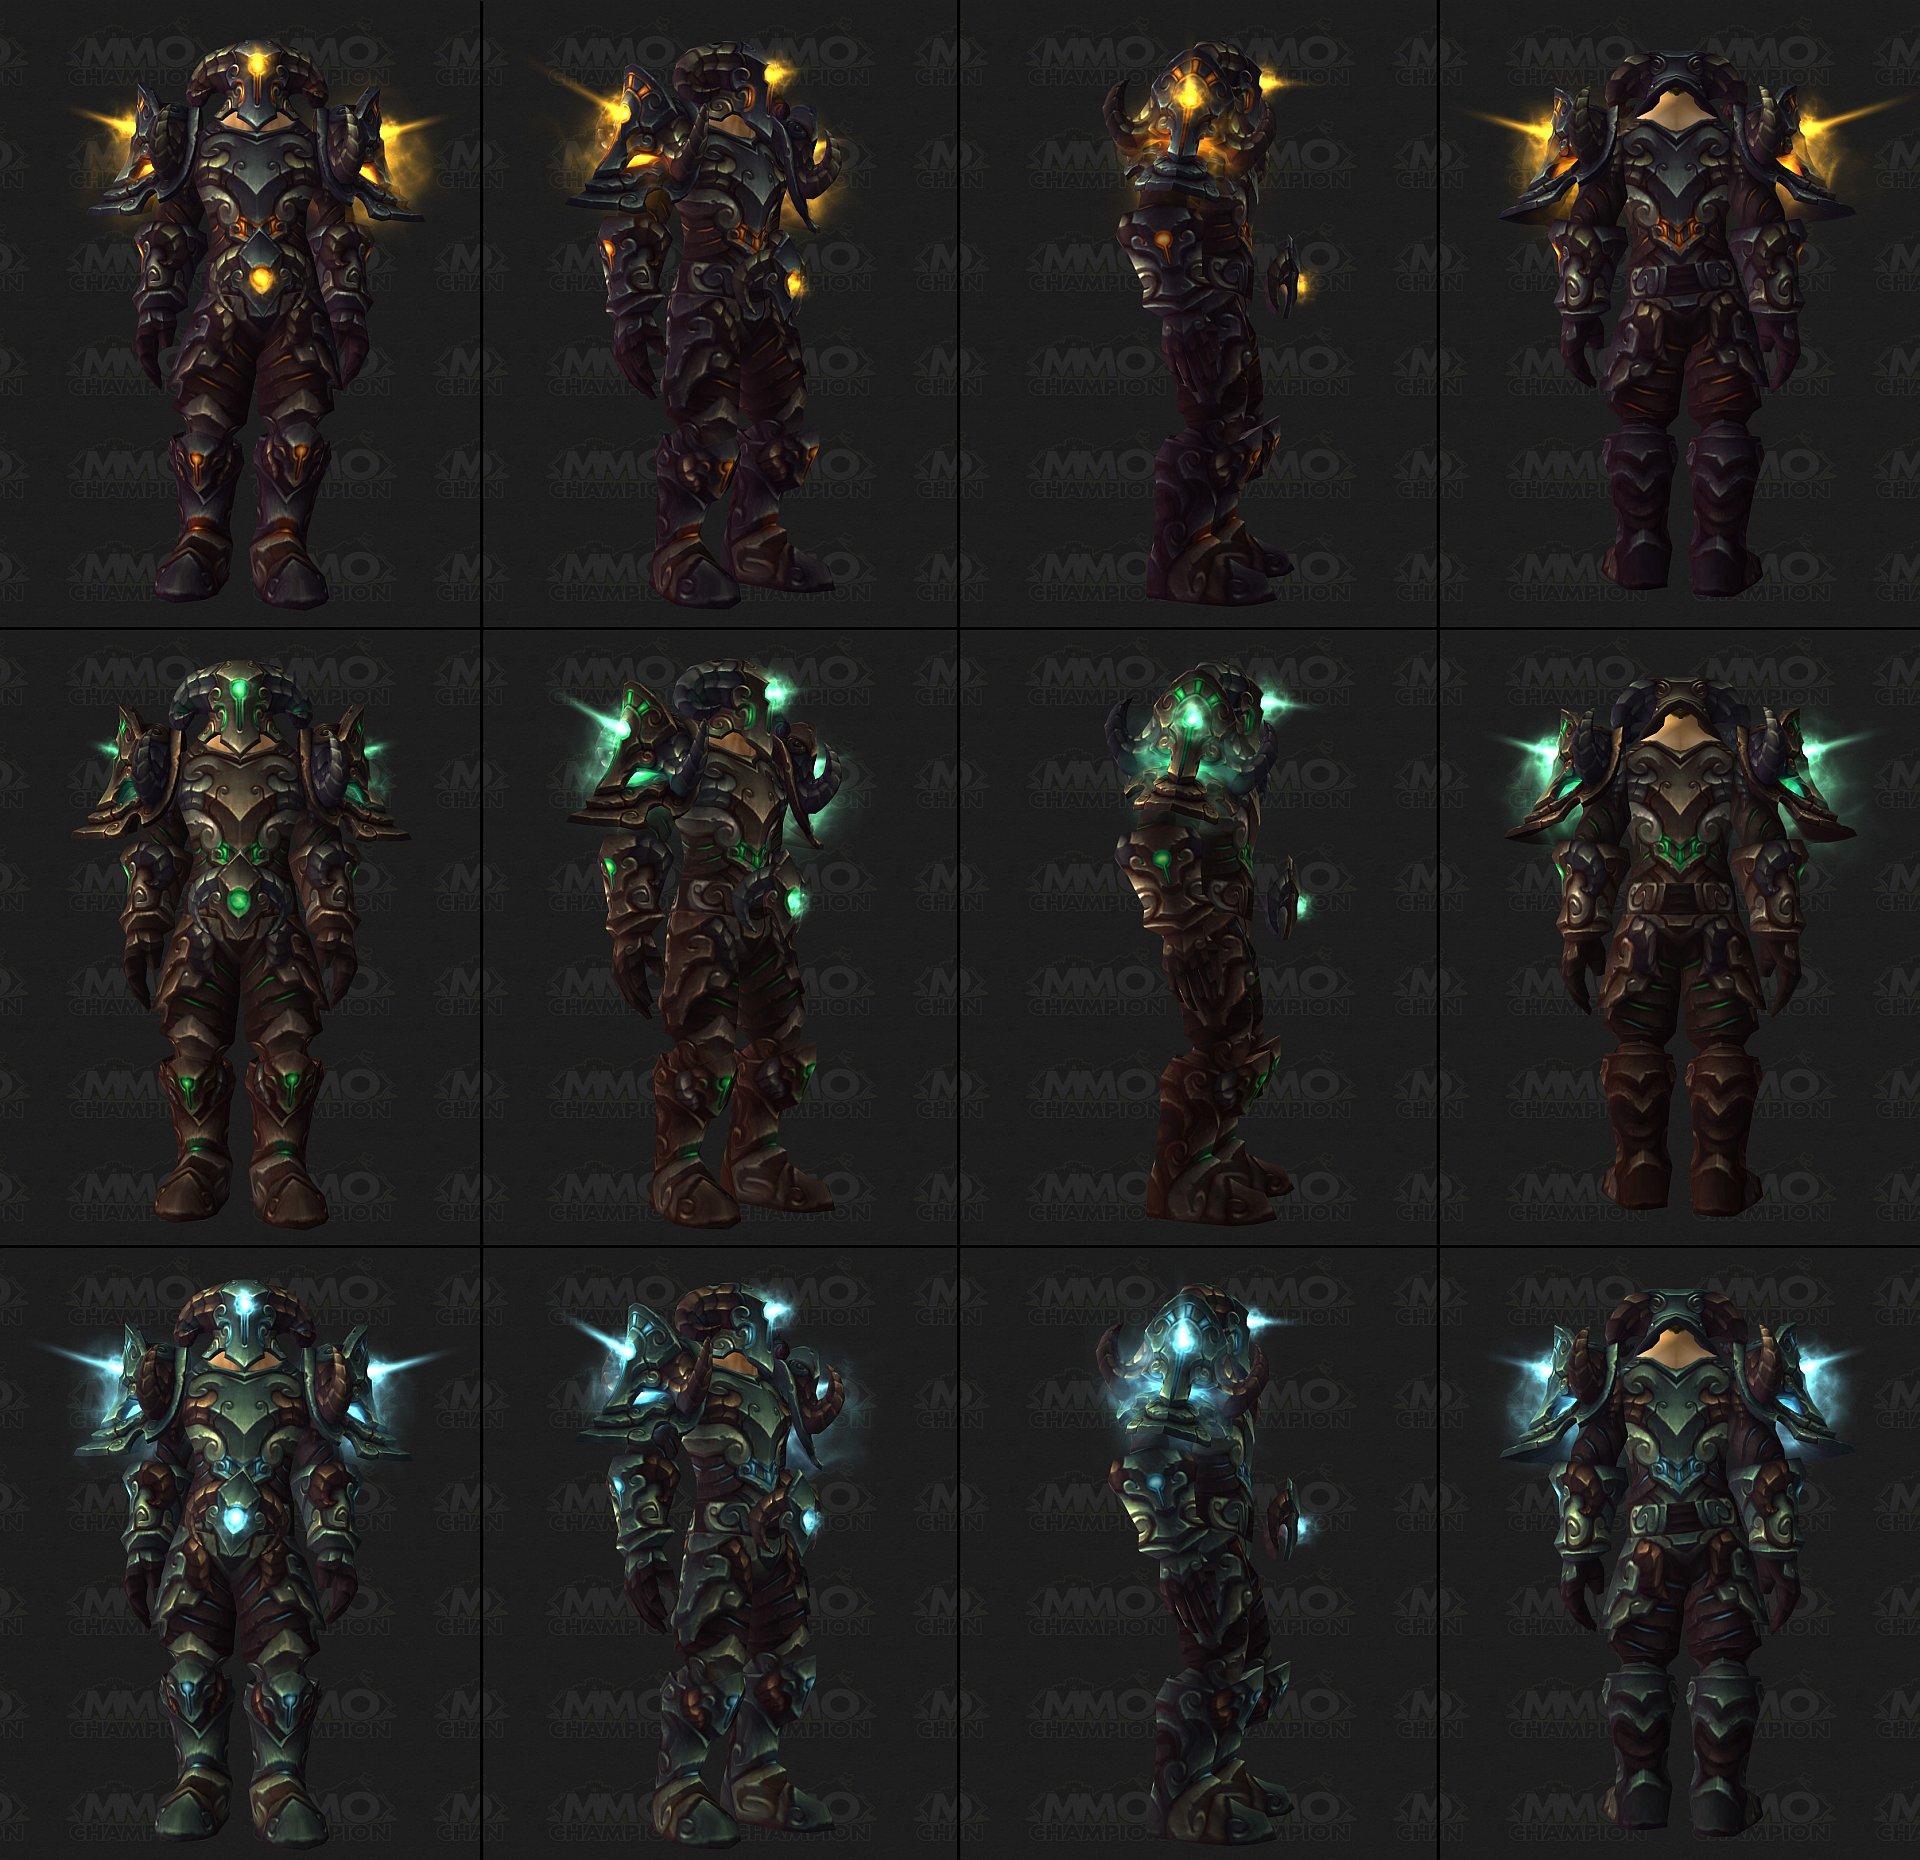 Todesritter T16 Set - Quelle: mmo-champion.com/content/3299-Tier-16-Death-Knight-Set-5-4-NYI-Glyphs-July-8-Raid-Testing-Blue-Posts-DLC-396